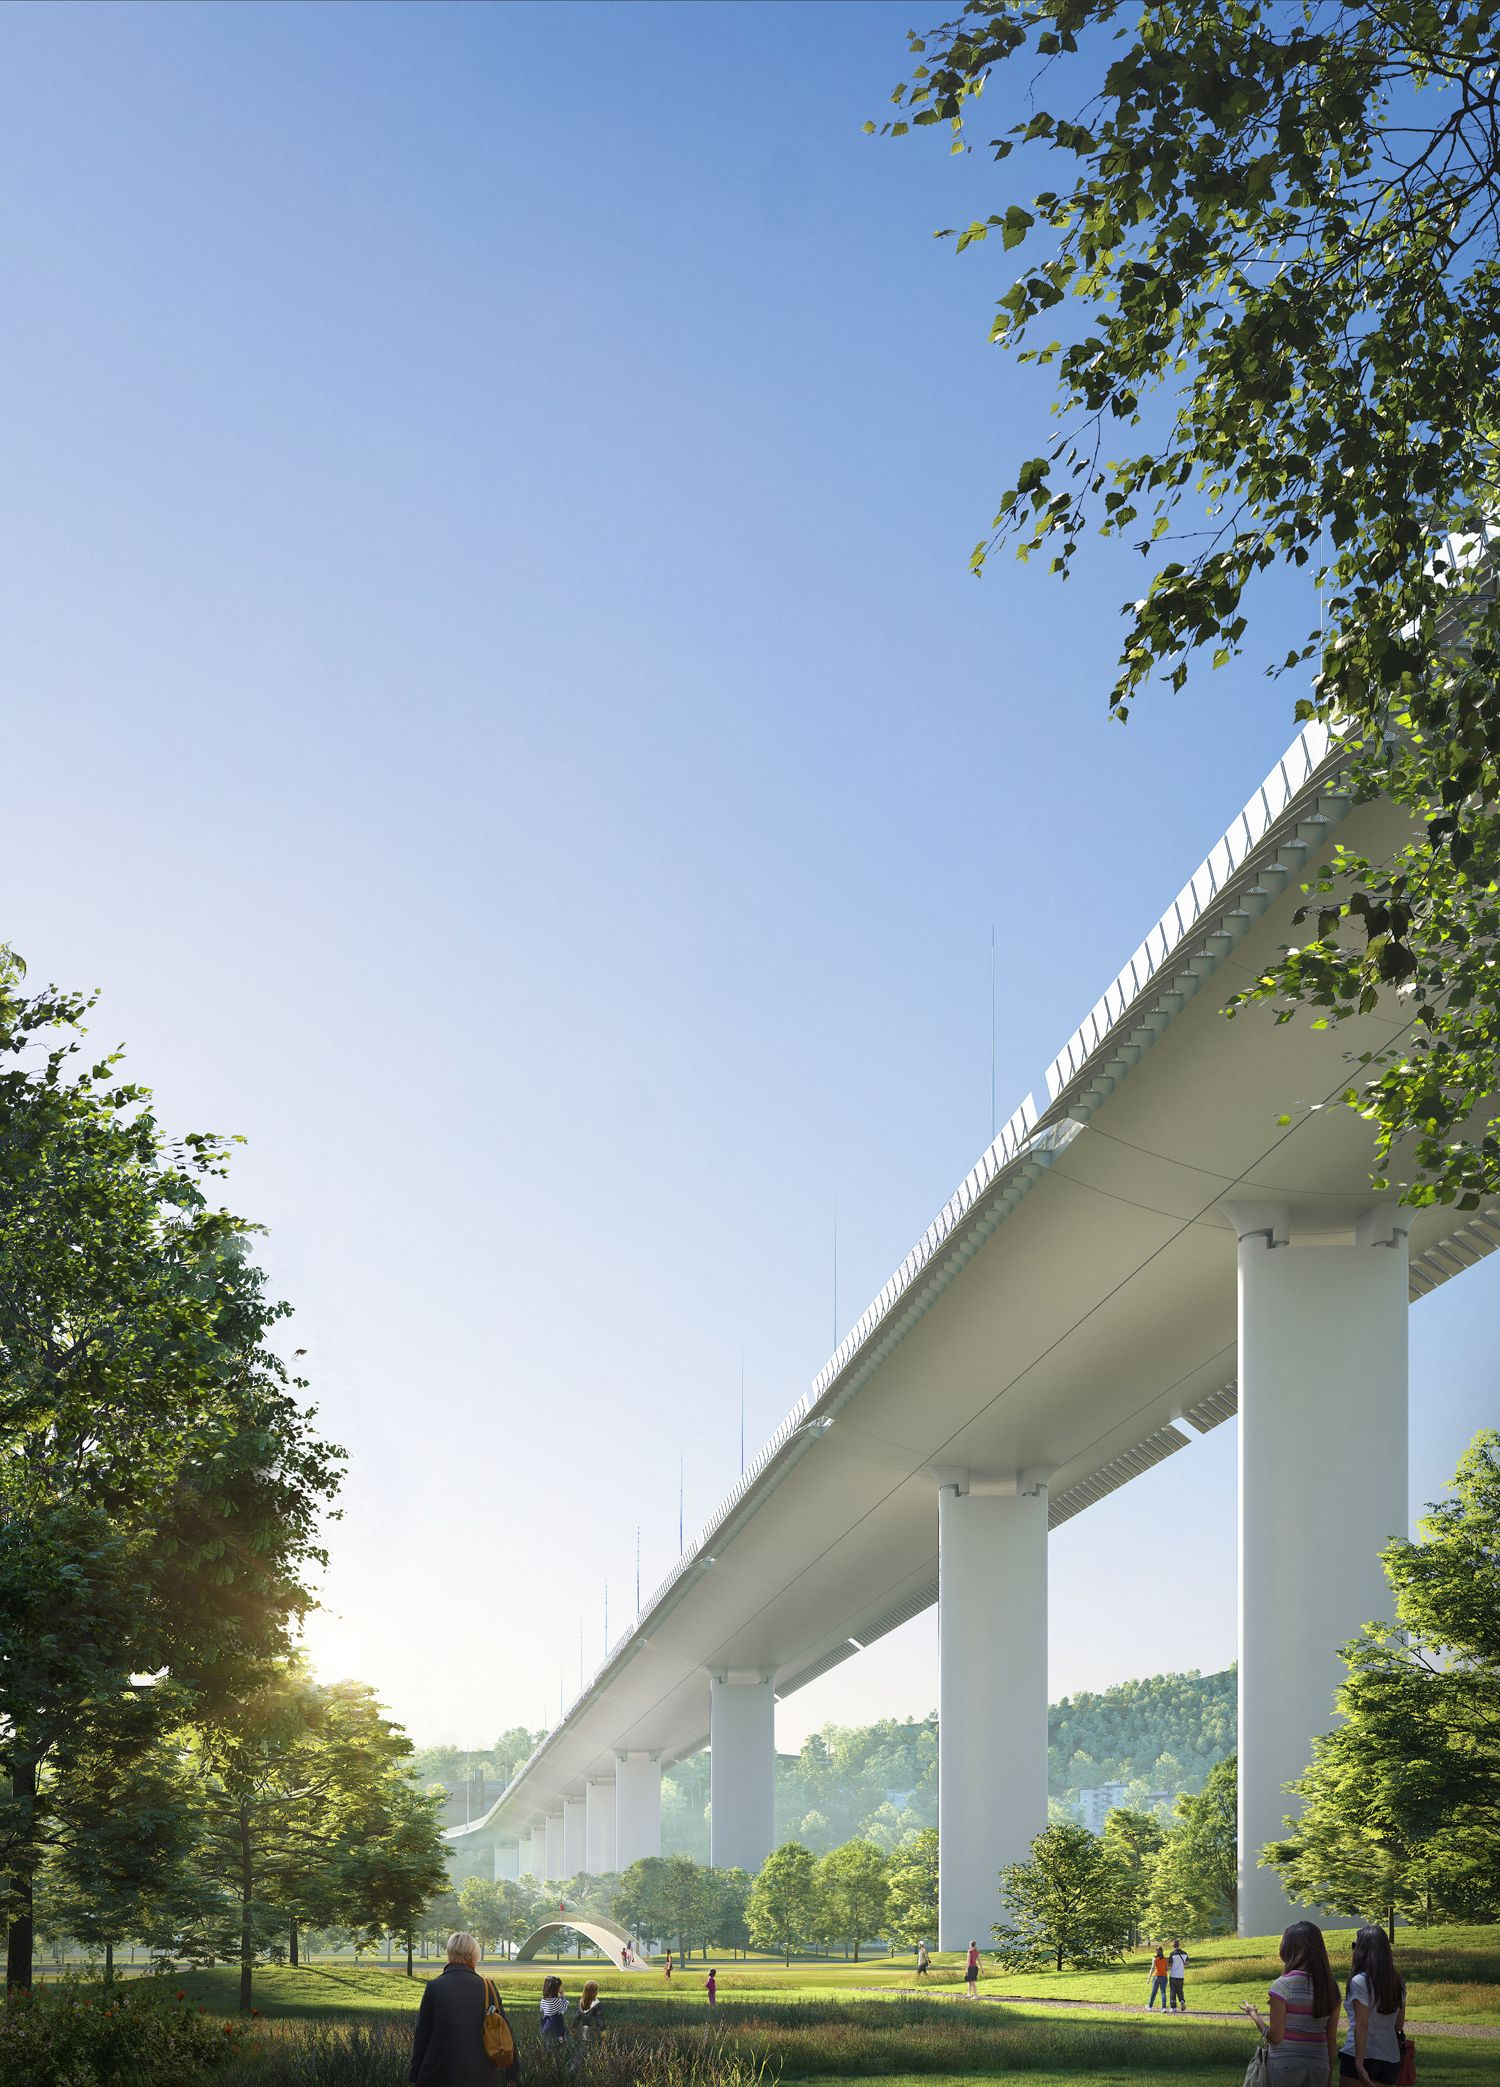 Opere Di Renzo Piano artikel - structure - magazin für tragwerksplanung und